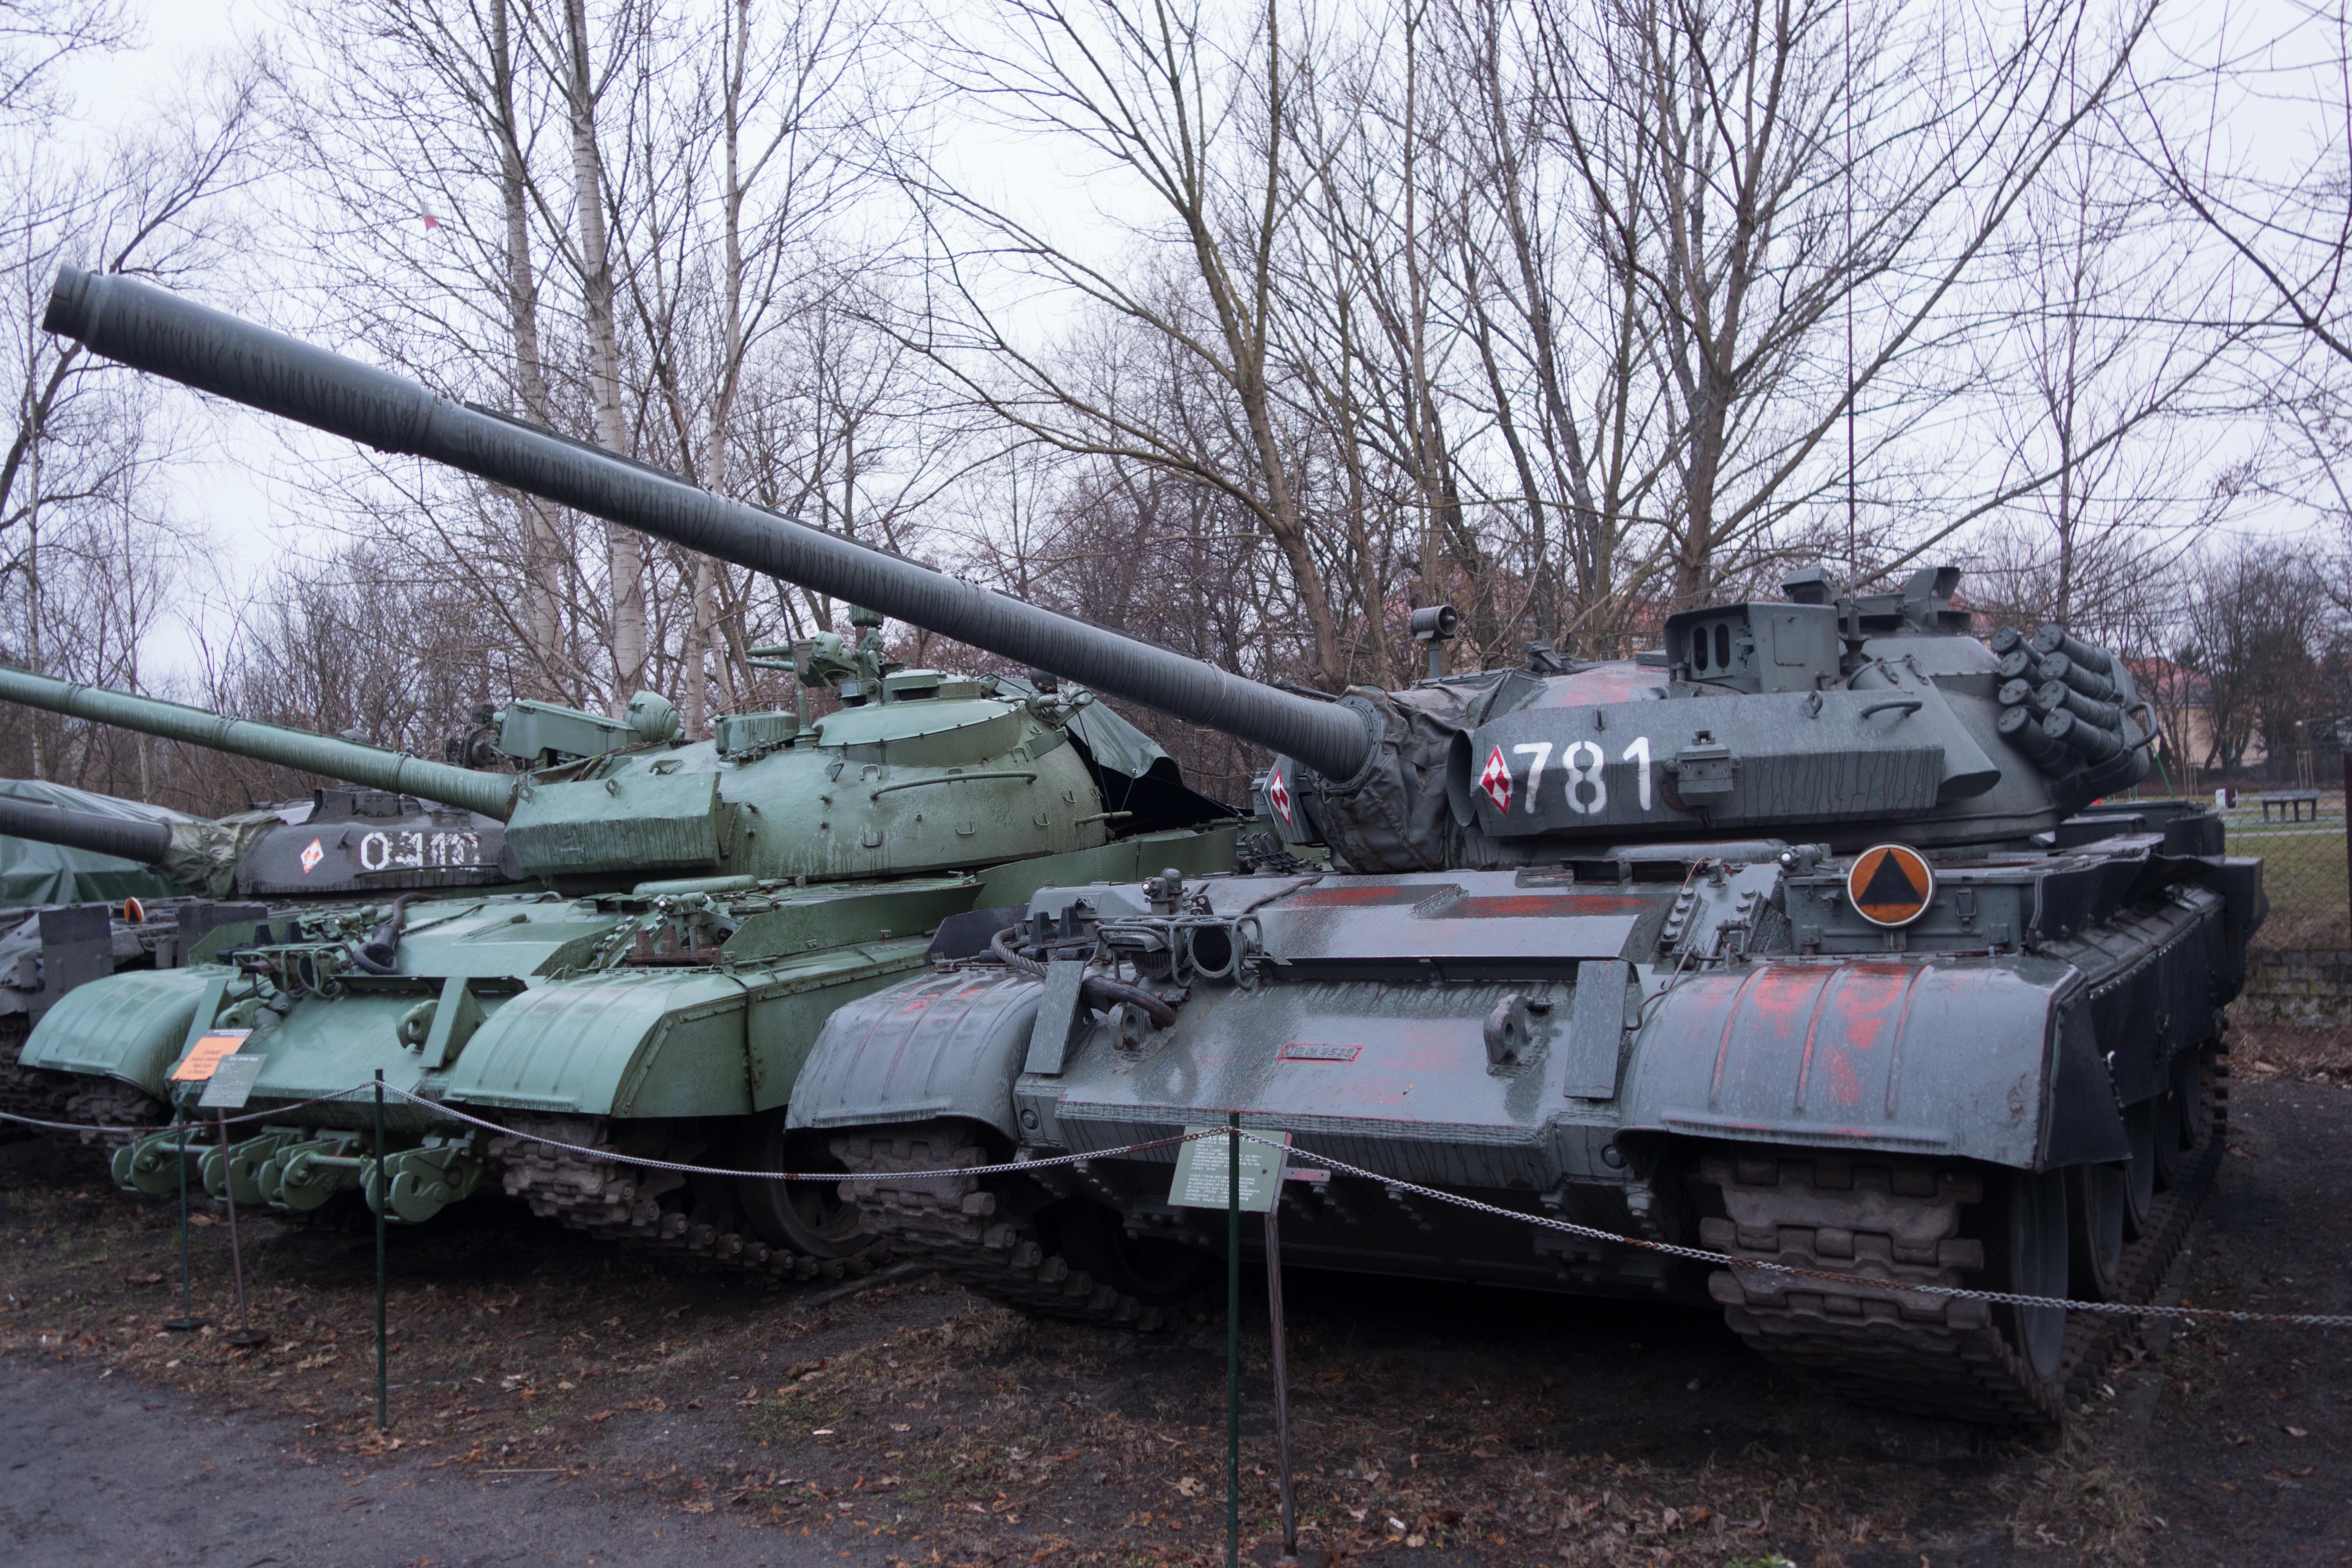 55AM_tank_(22905532890).jpg